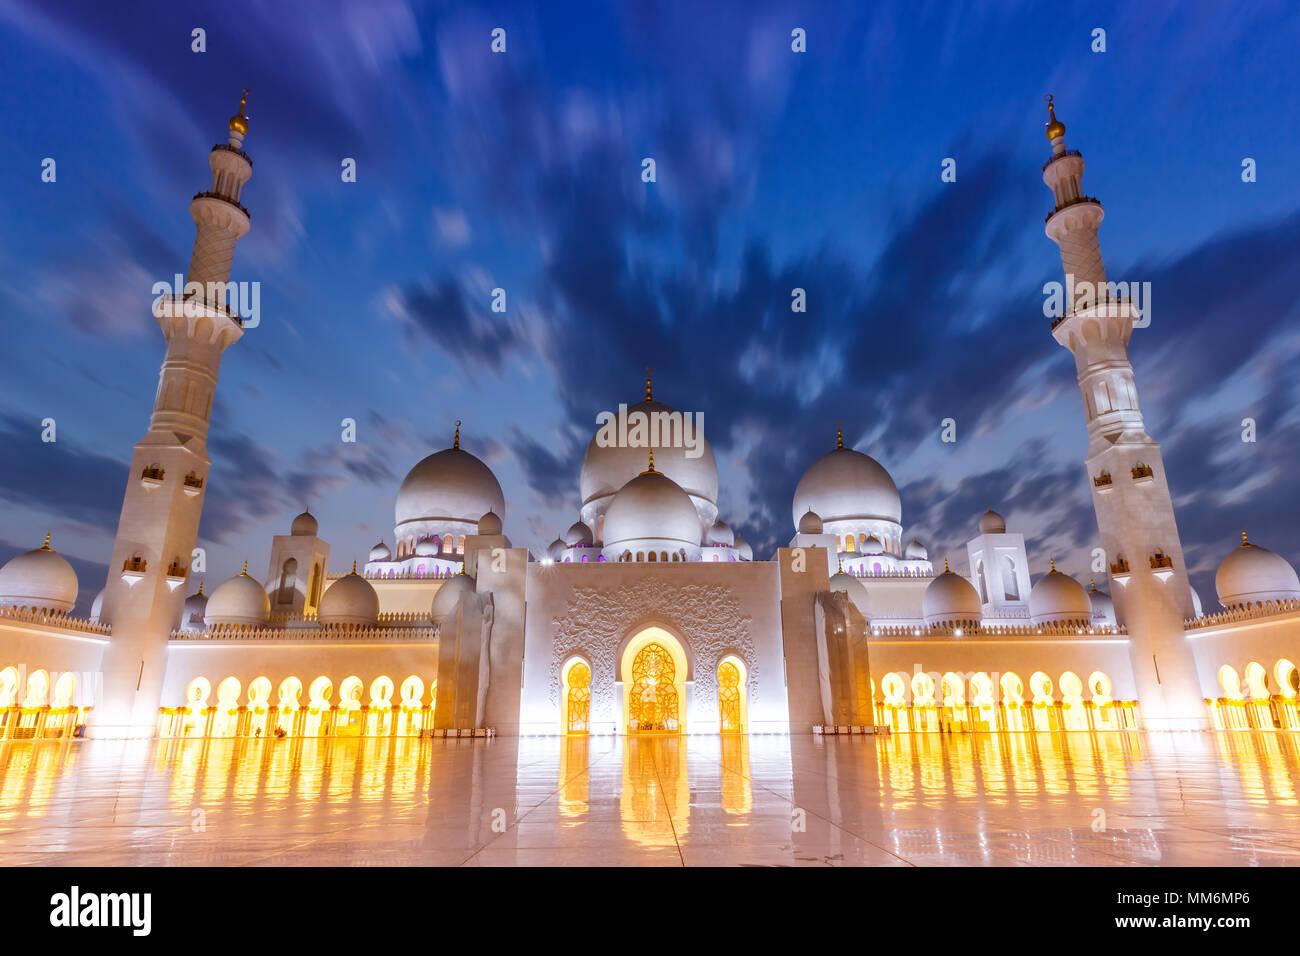 Abu Dhabi Gran Mezquita de Sheikh Zayed twilight minaretes Emiratos Arabes Unidos UAE Imagen De Stock